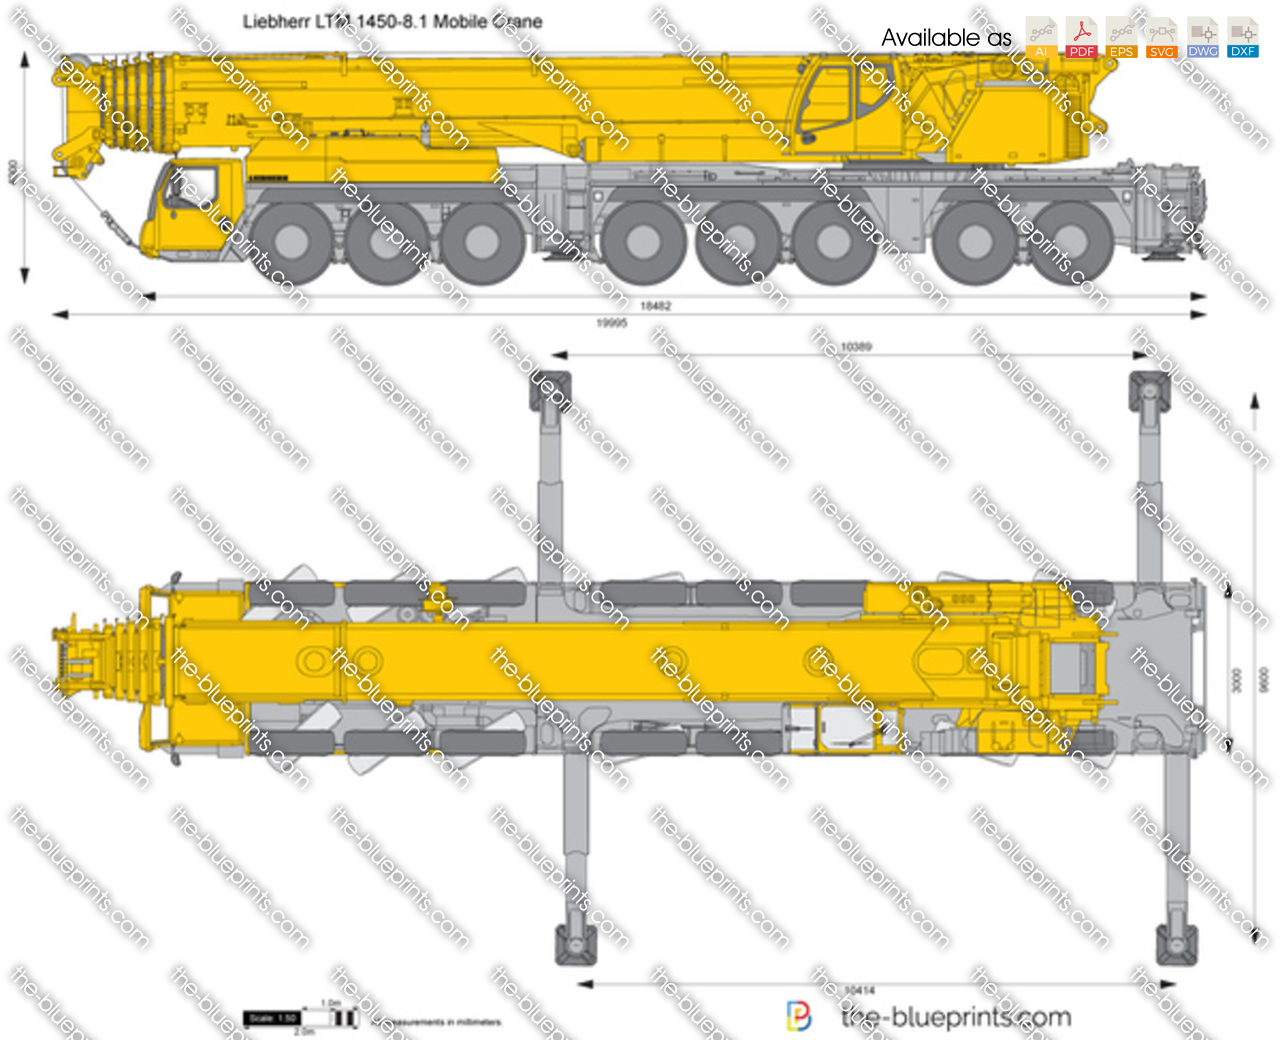 Liebherr LTM 1450-8.1 Mobile Crane